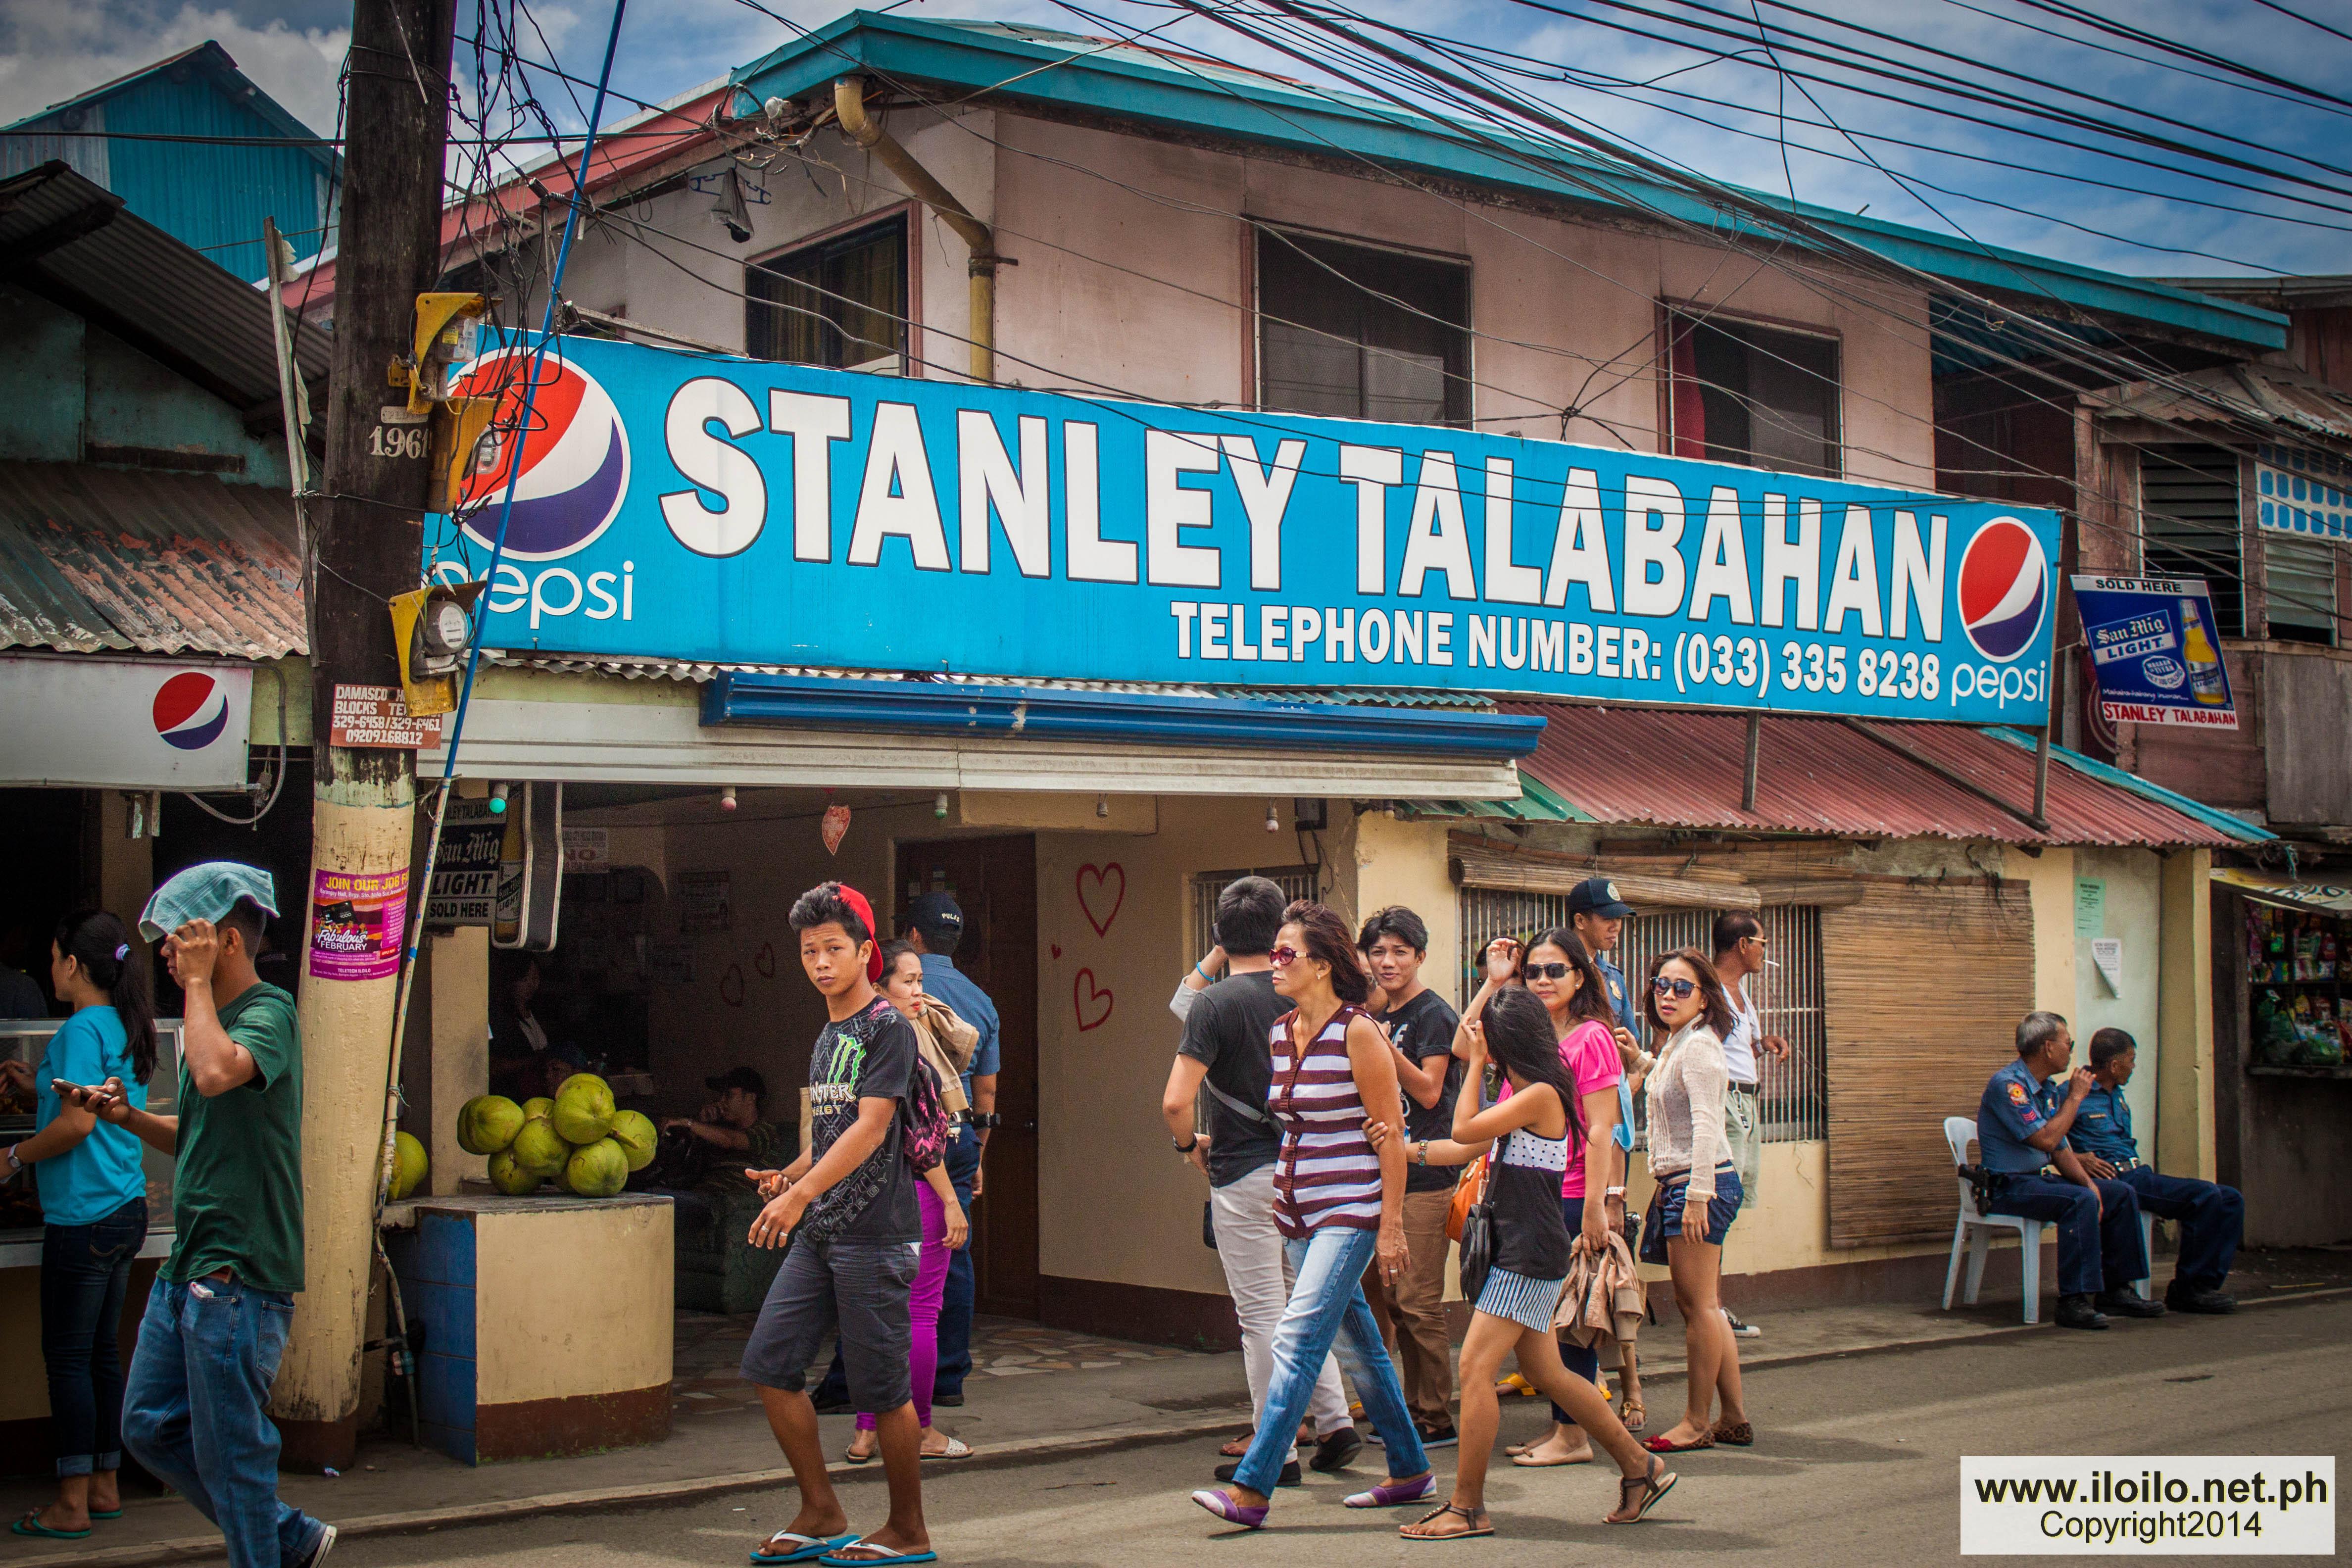 Stanley Talabahan